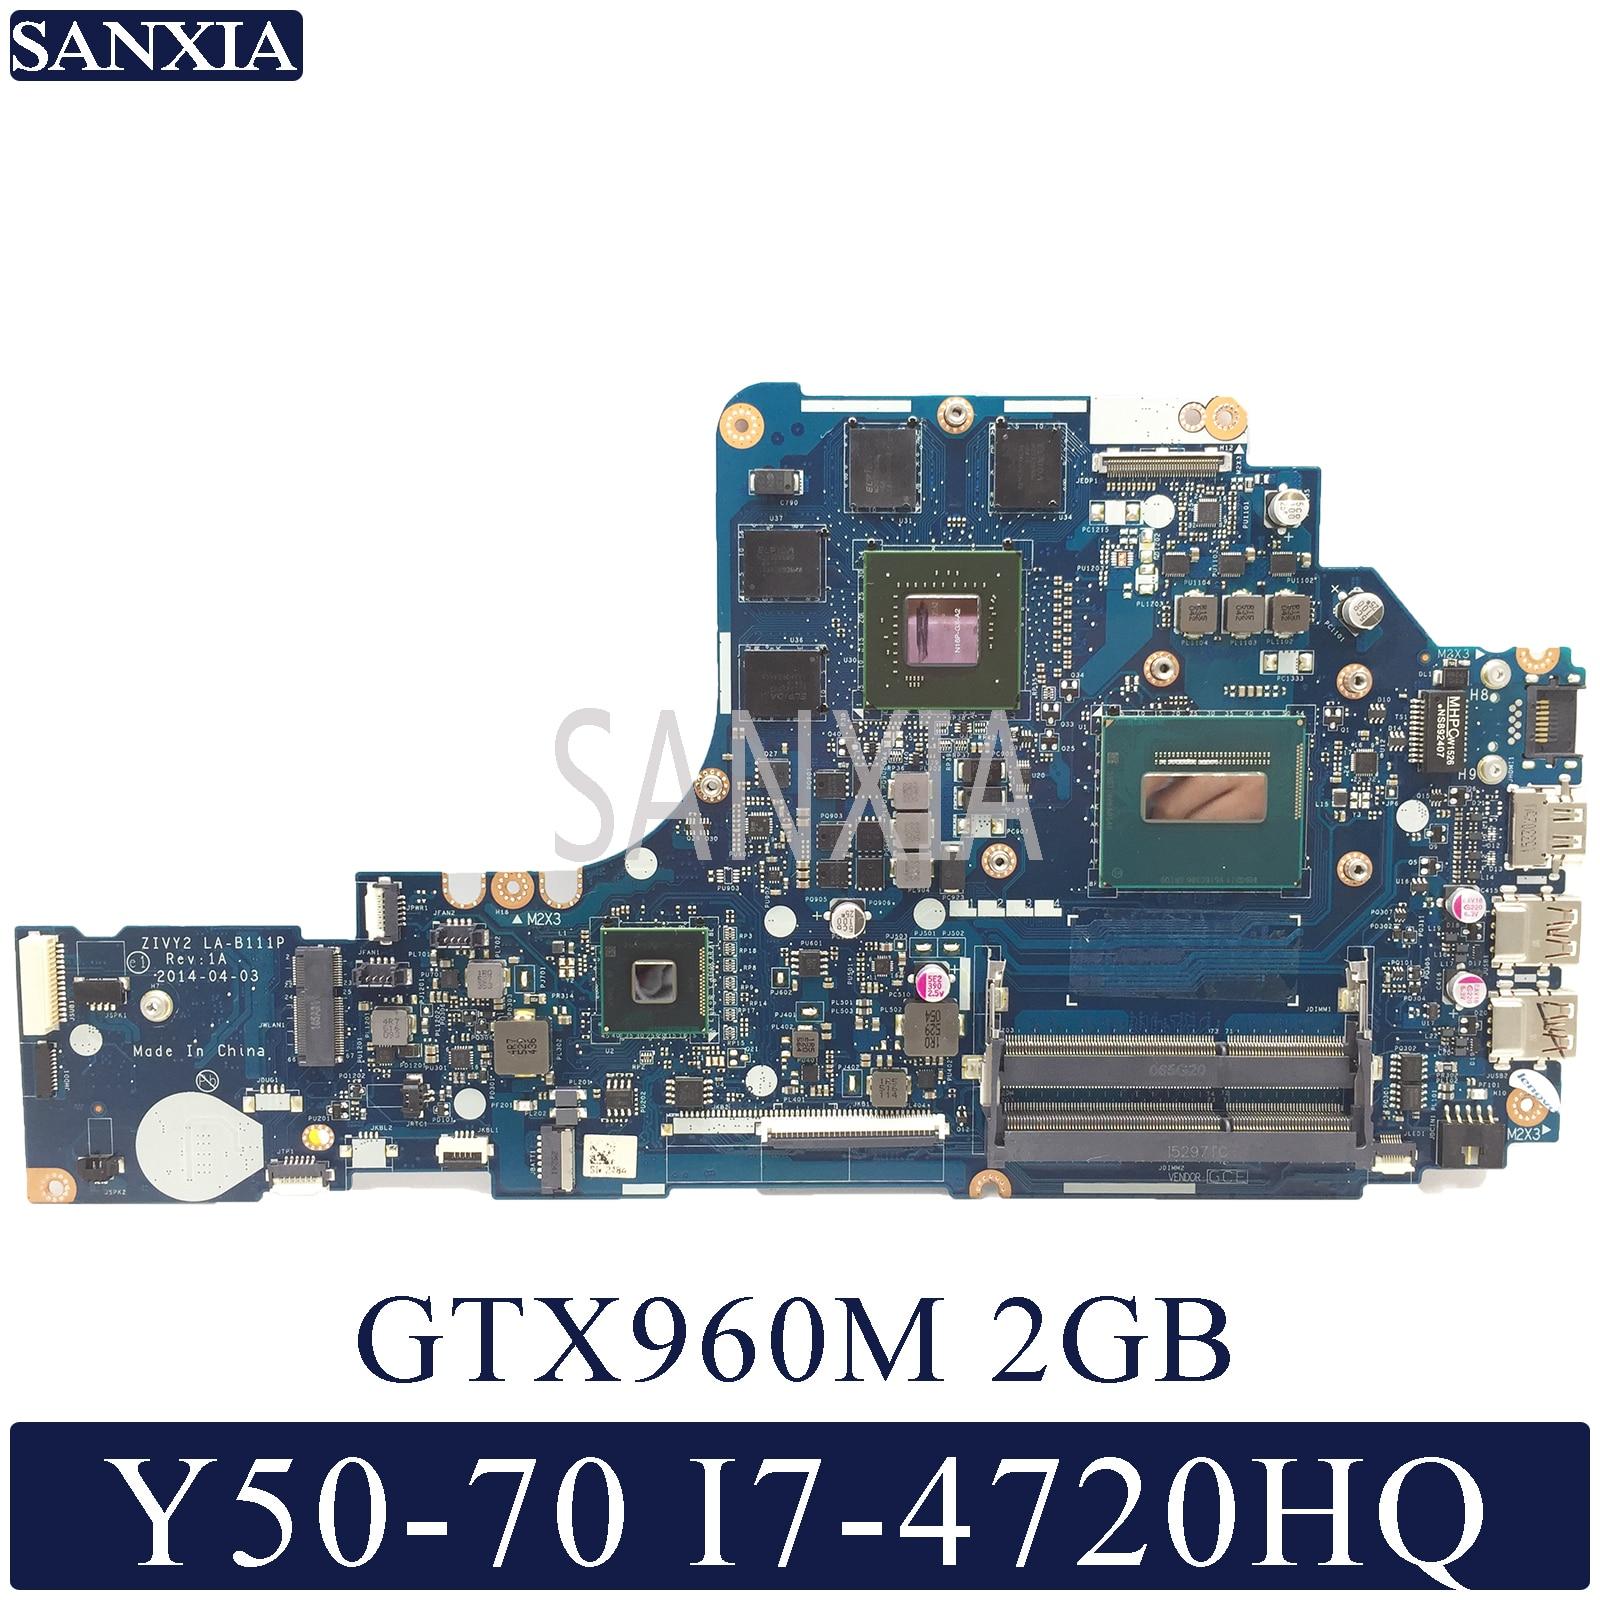 KEFU LA-B111P Laptop Motherboard For Lenovo Y50-70 Original Mainboard I7-4720HQ/4710HQ GTX960M-2GB